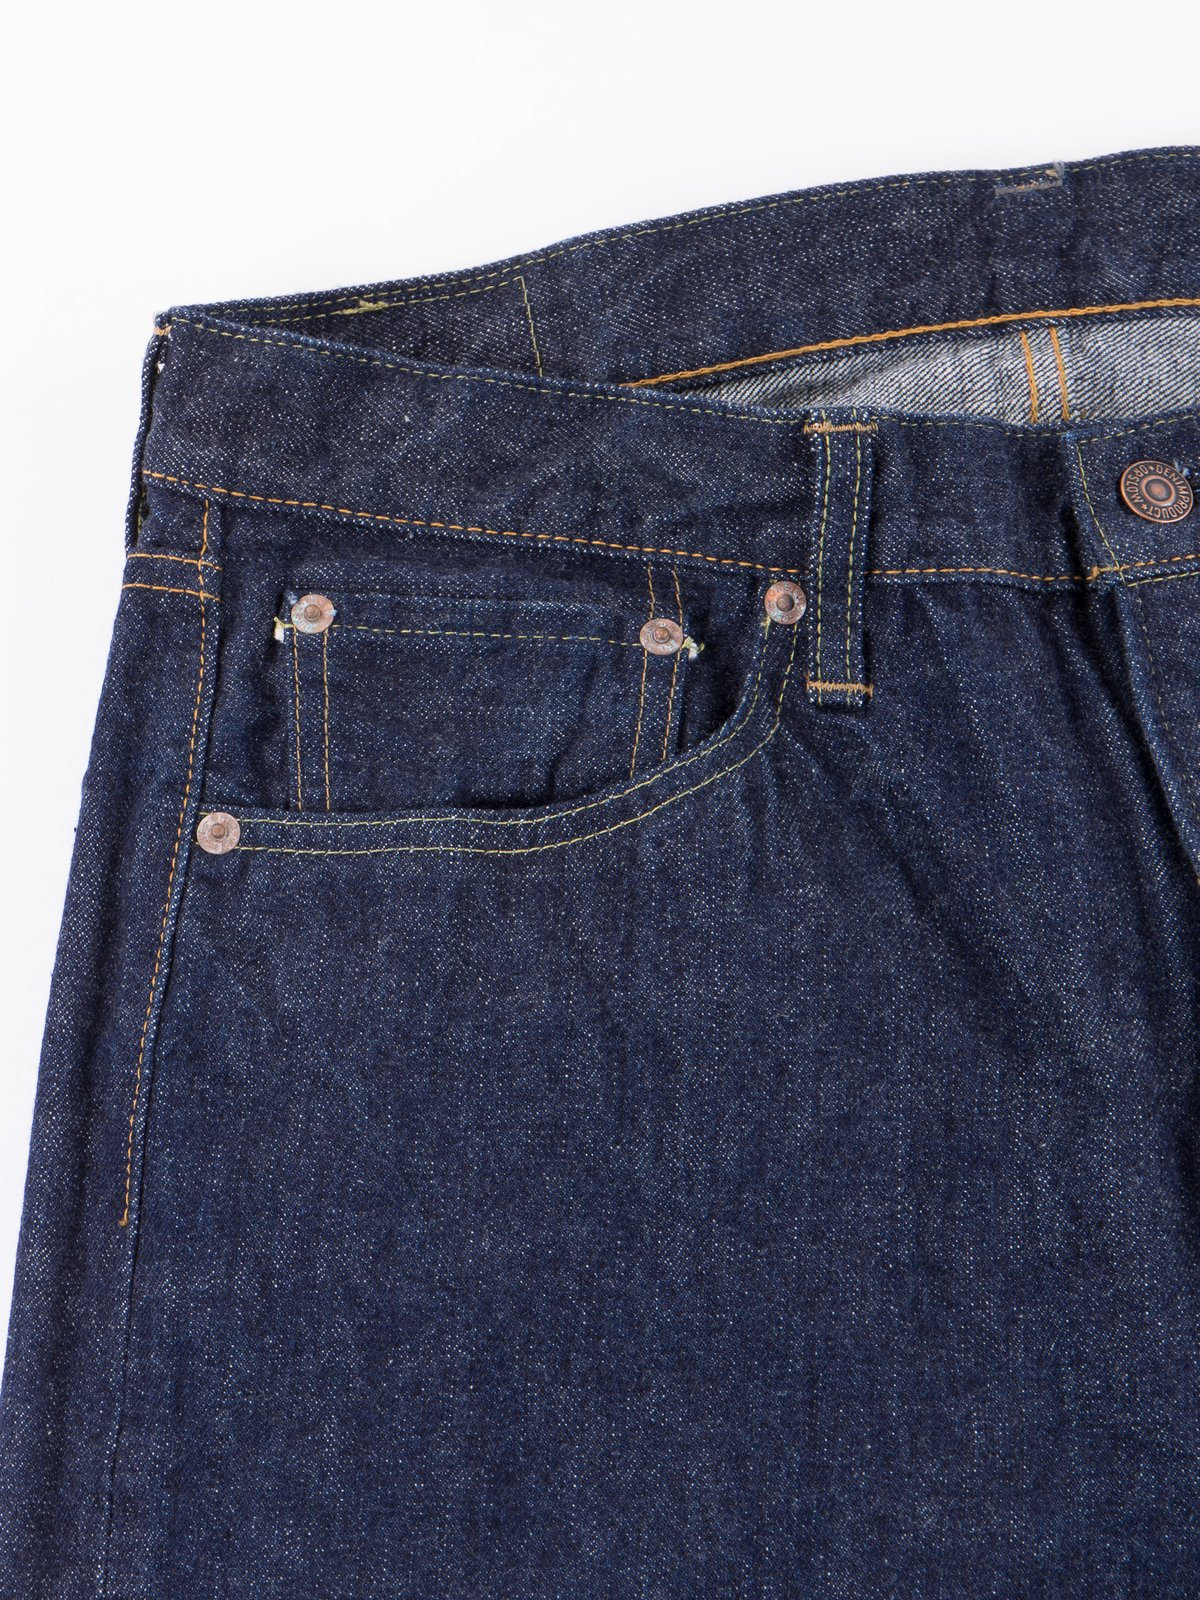 One Wash 107 Slim Fit Jean - Image 3